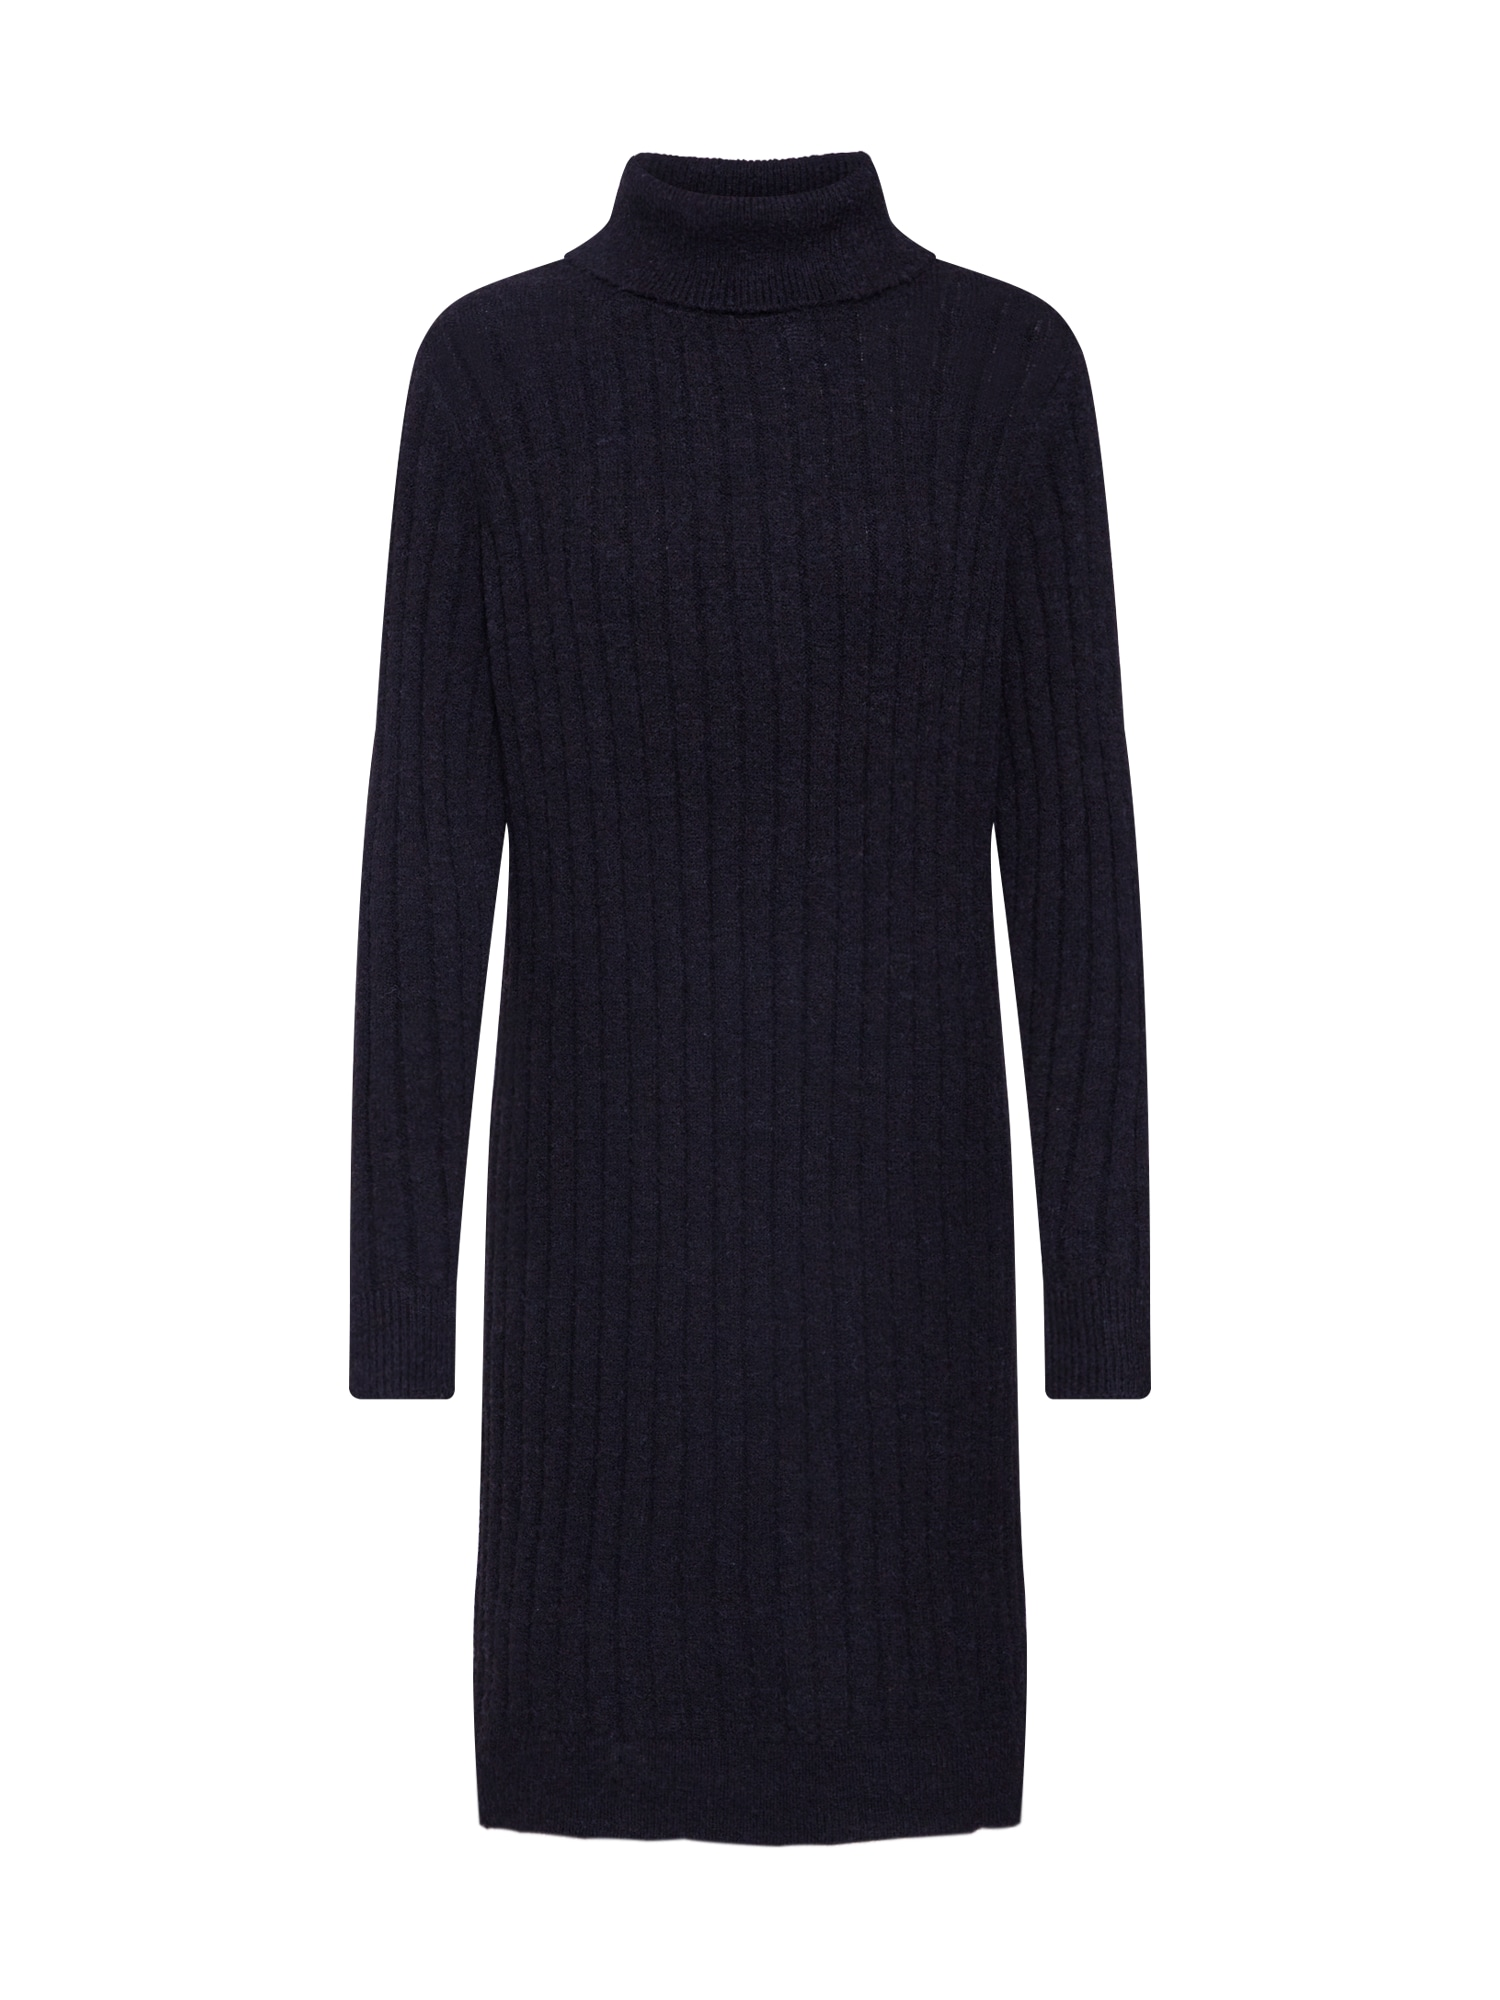 Y.A.S Megzta suknelė 'Campus' juoda